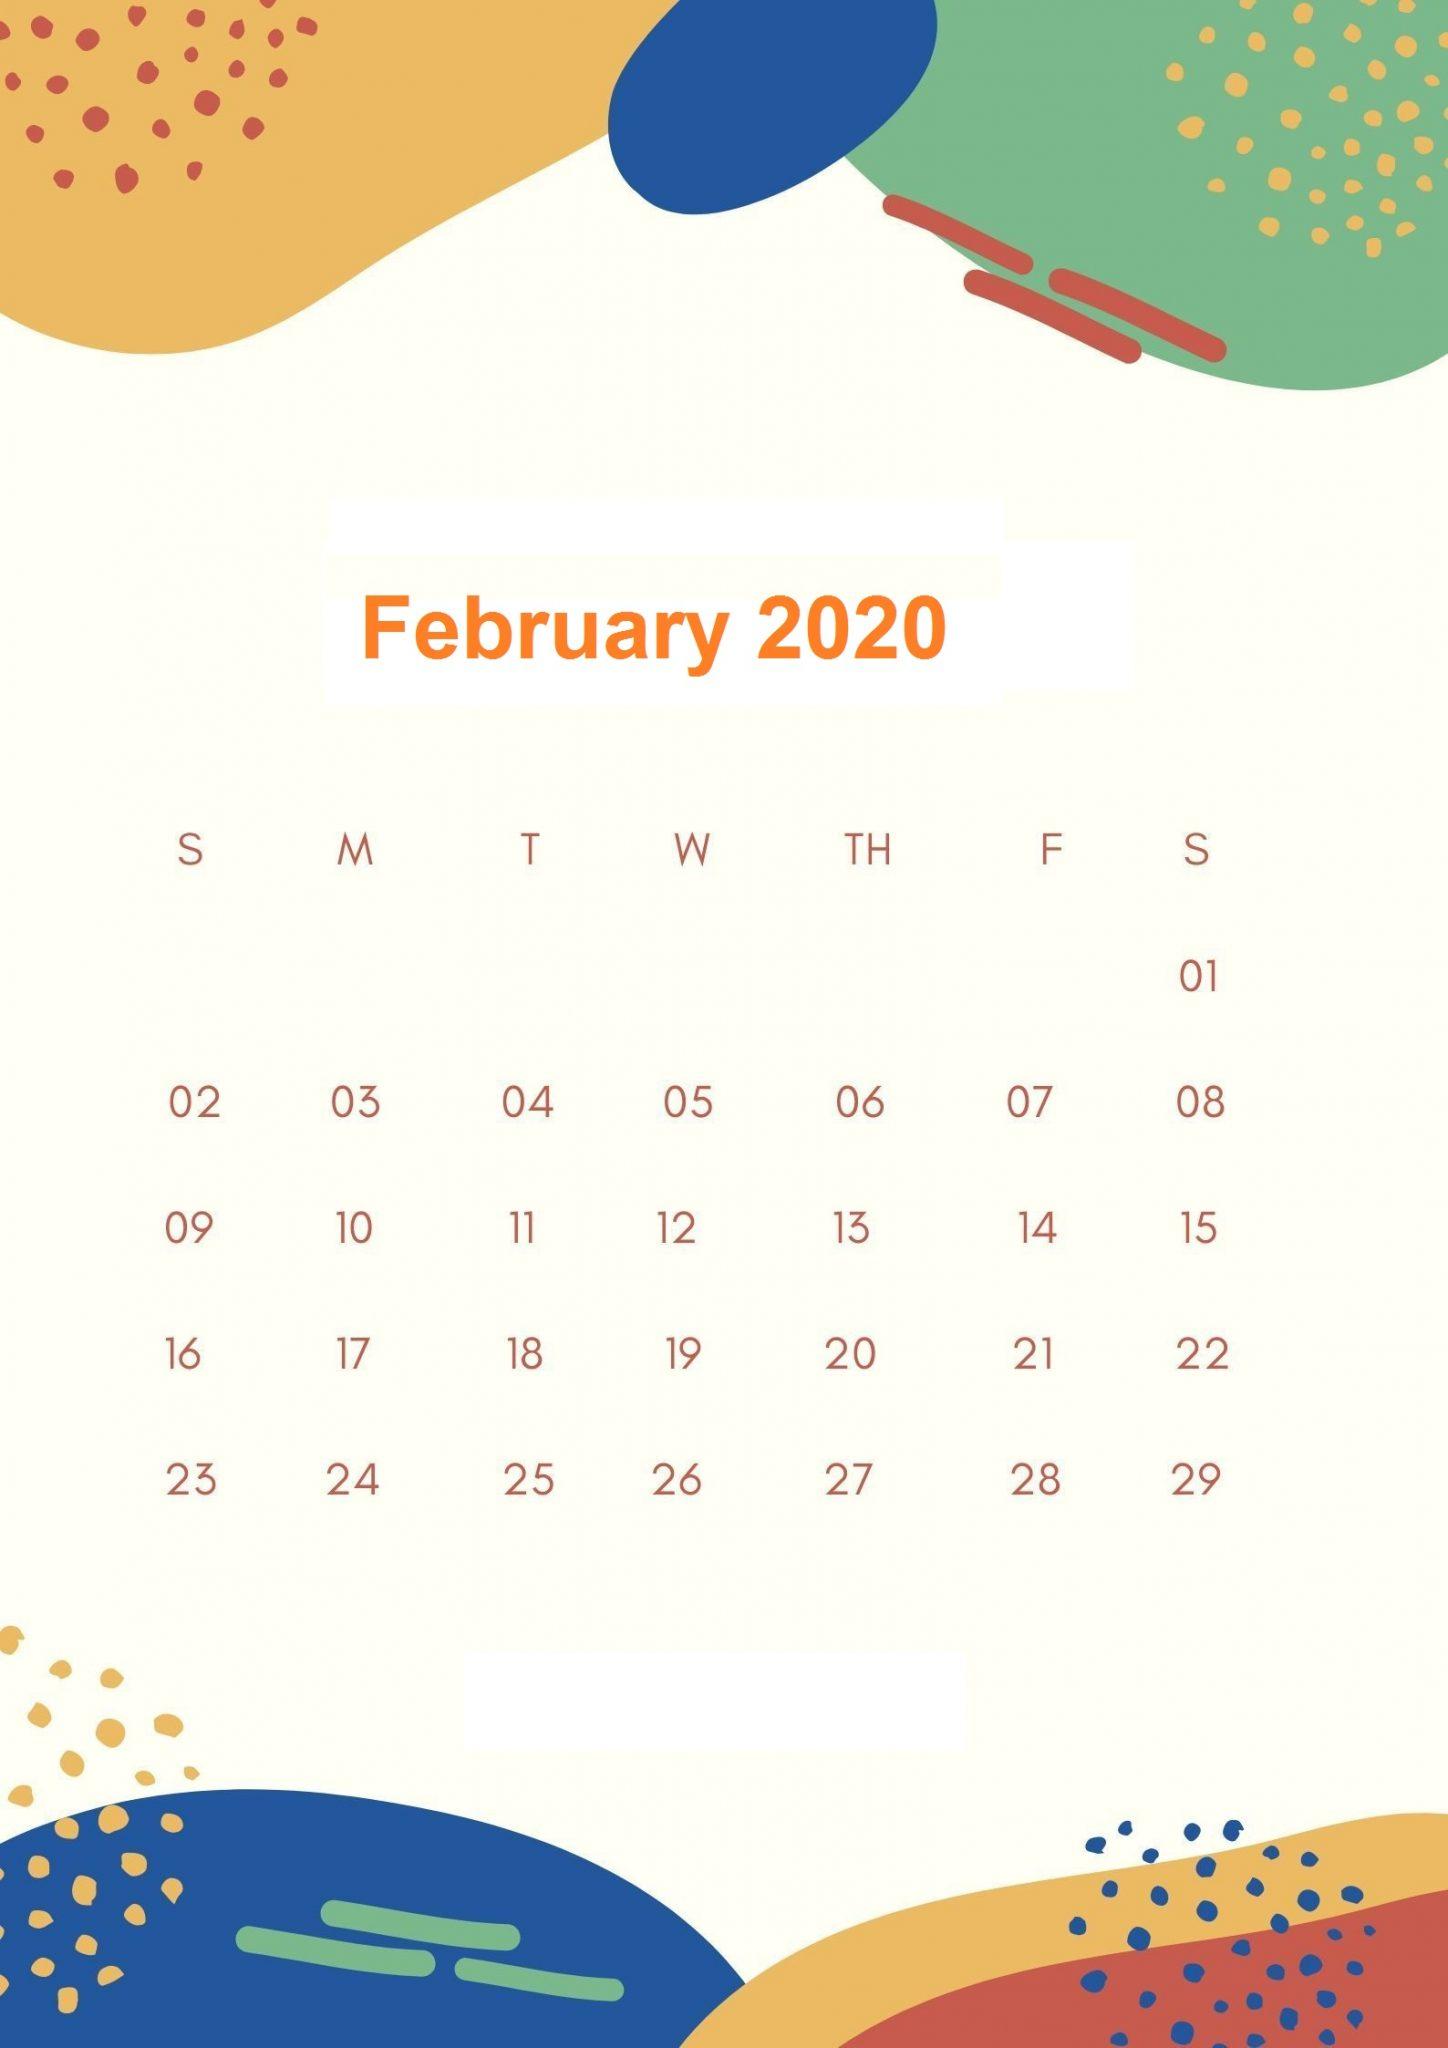 Floral February 2020 Wallpaper Calendar